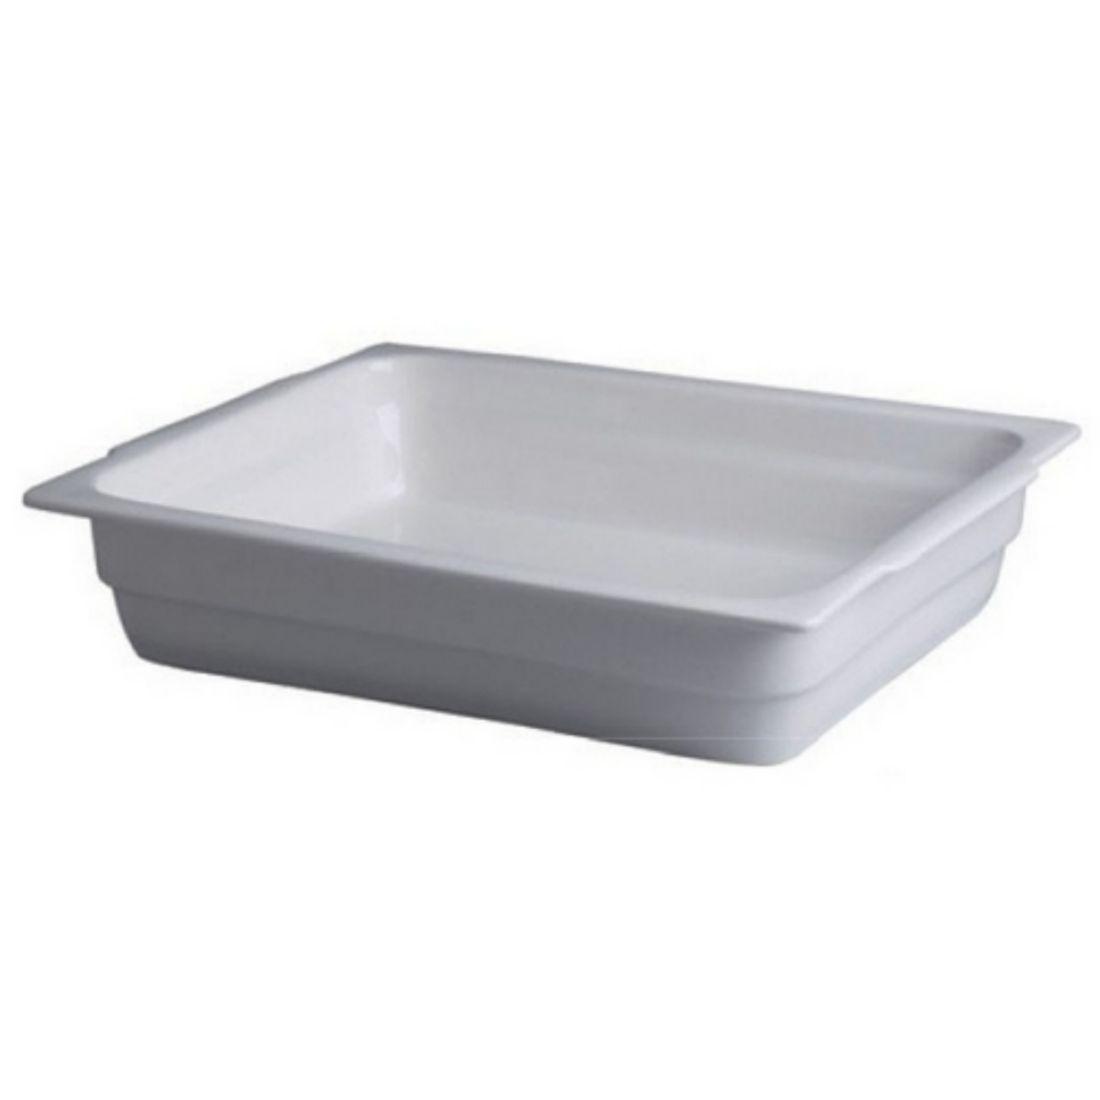 Buffet gastronádoba GN 2/3, 32,5 x 35,4 cm x 2,2